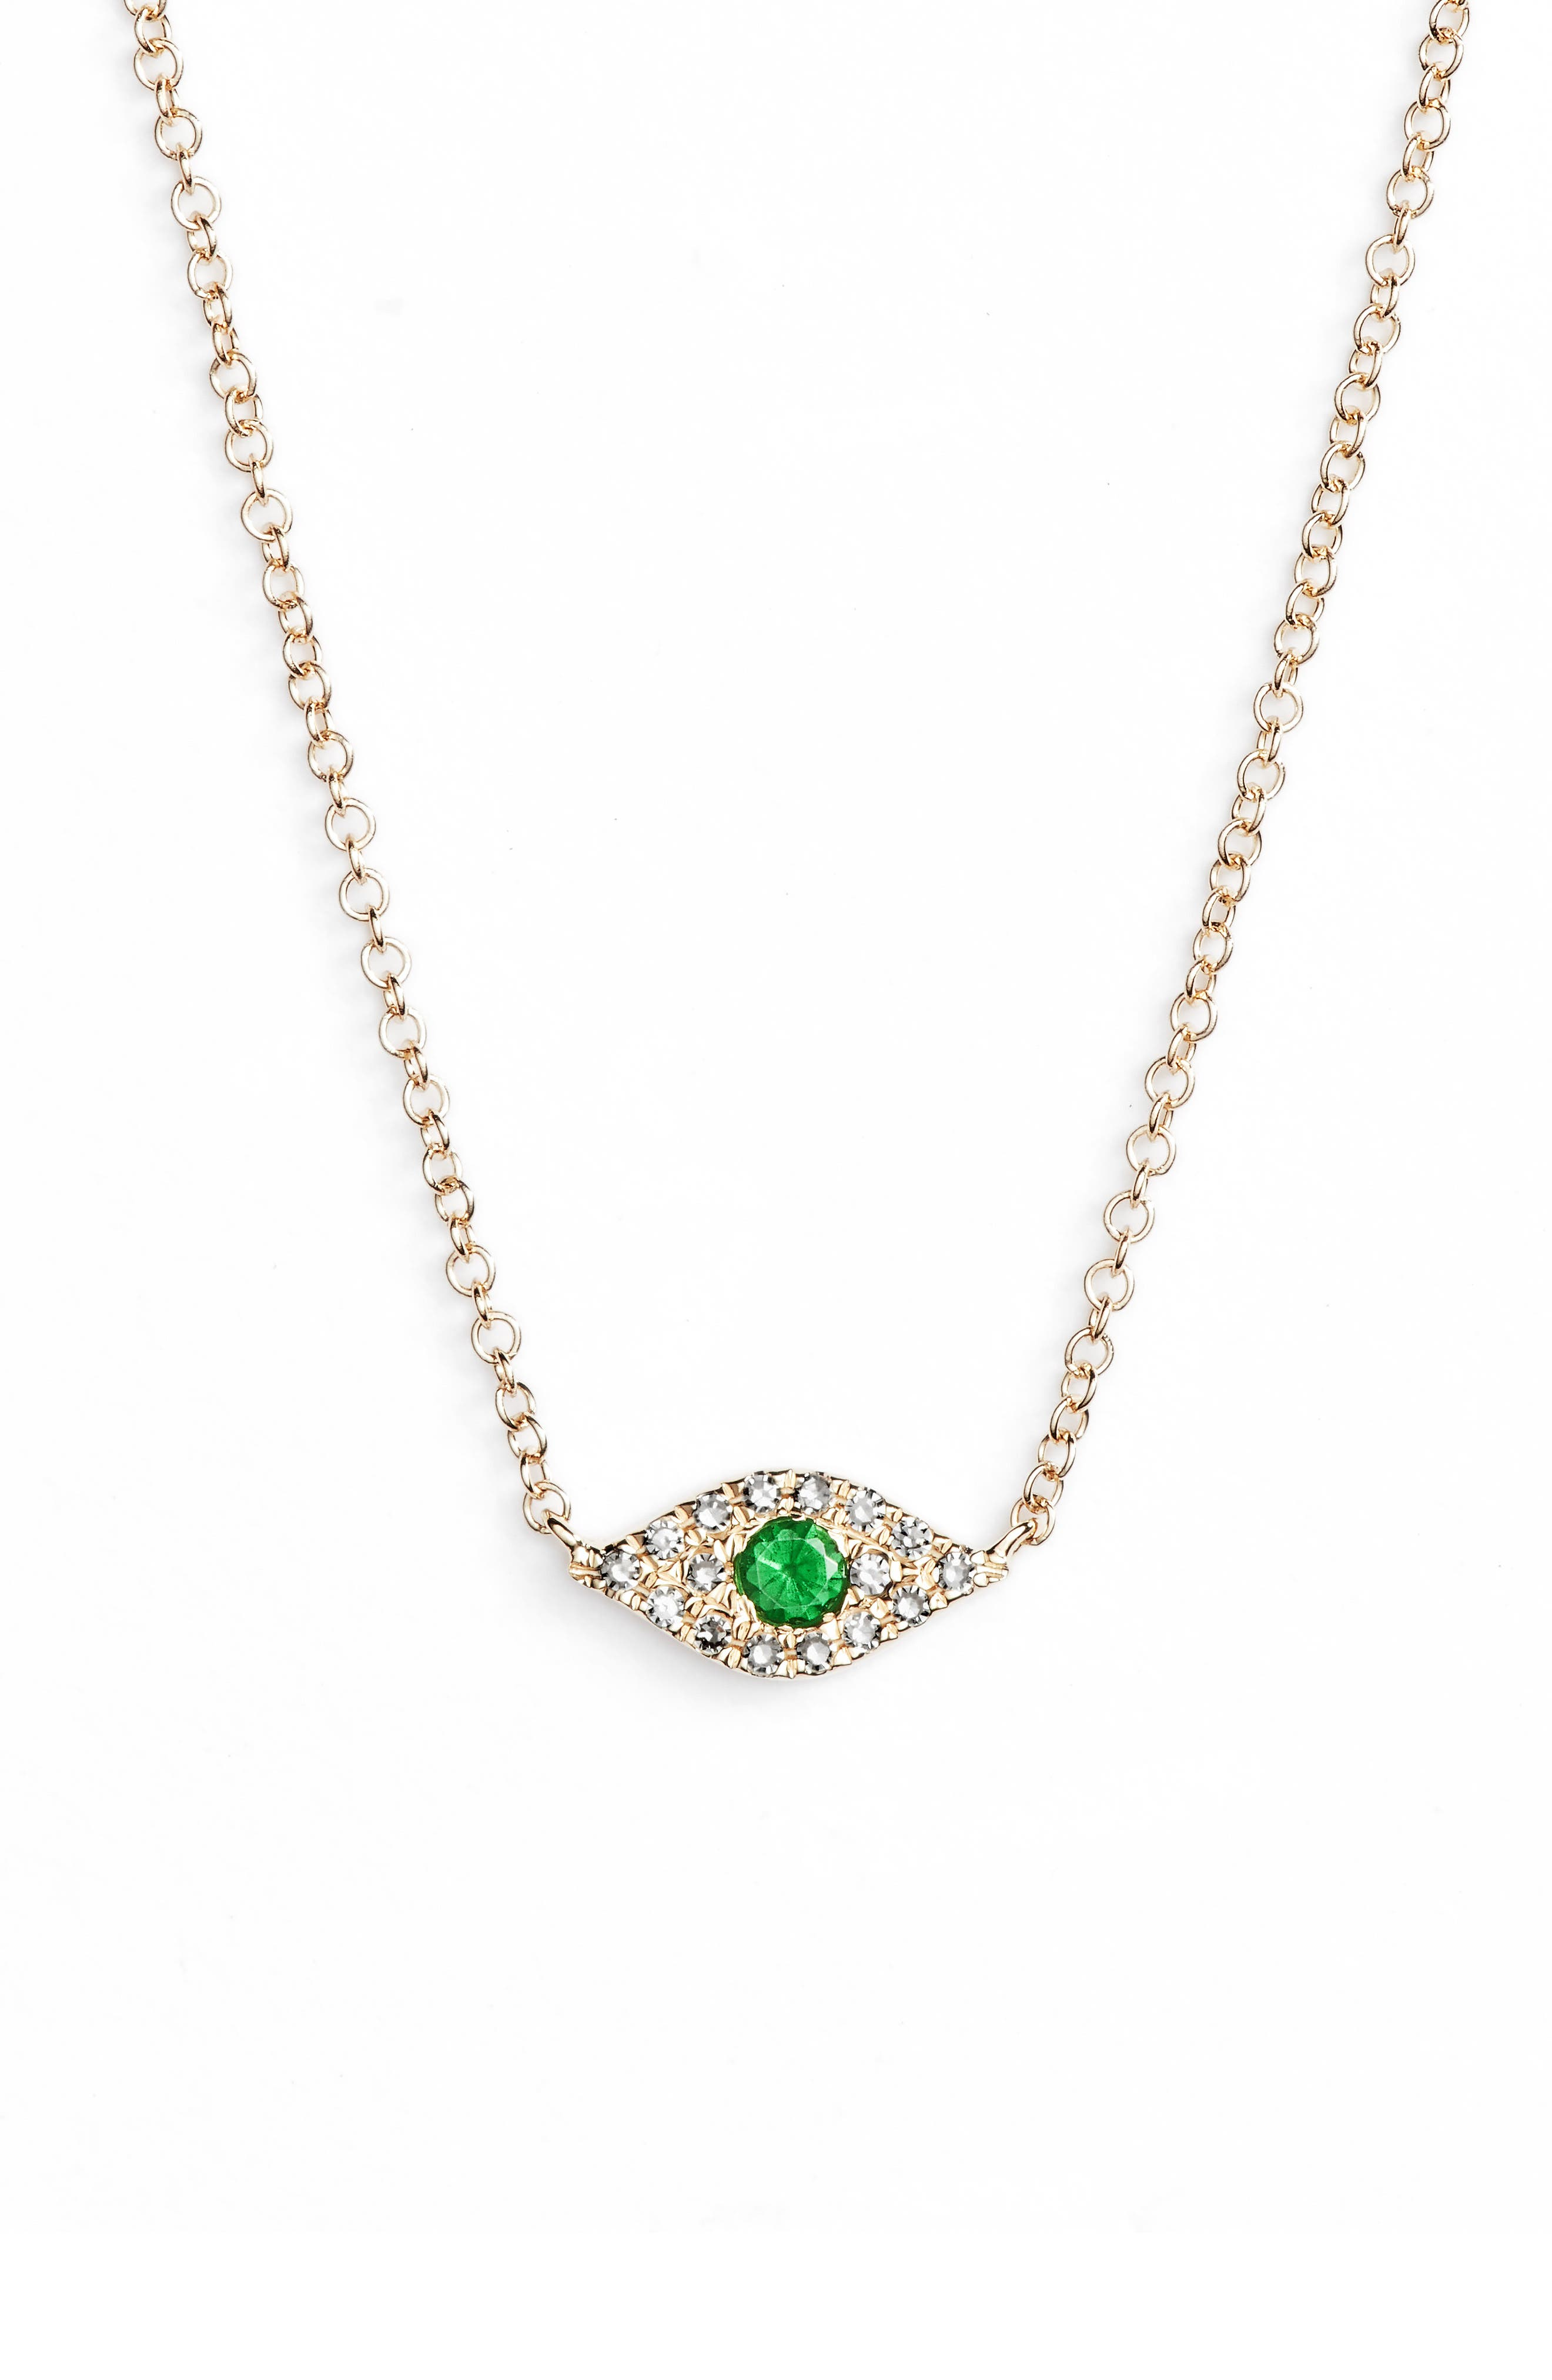 Evil Eye Diamond & Sapphire Pendant Necklace,                             Main thumbnail 1, color,                             YELLOW GOLD/ TSAVORITE